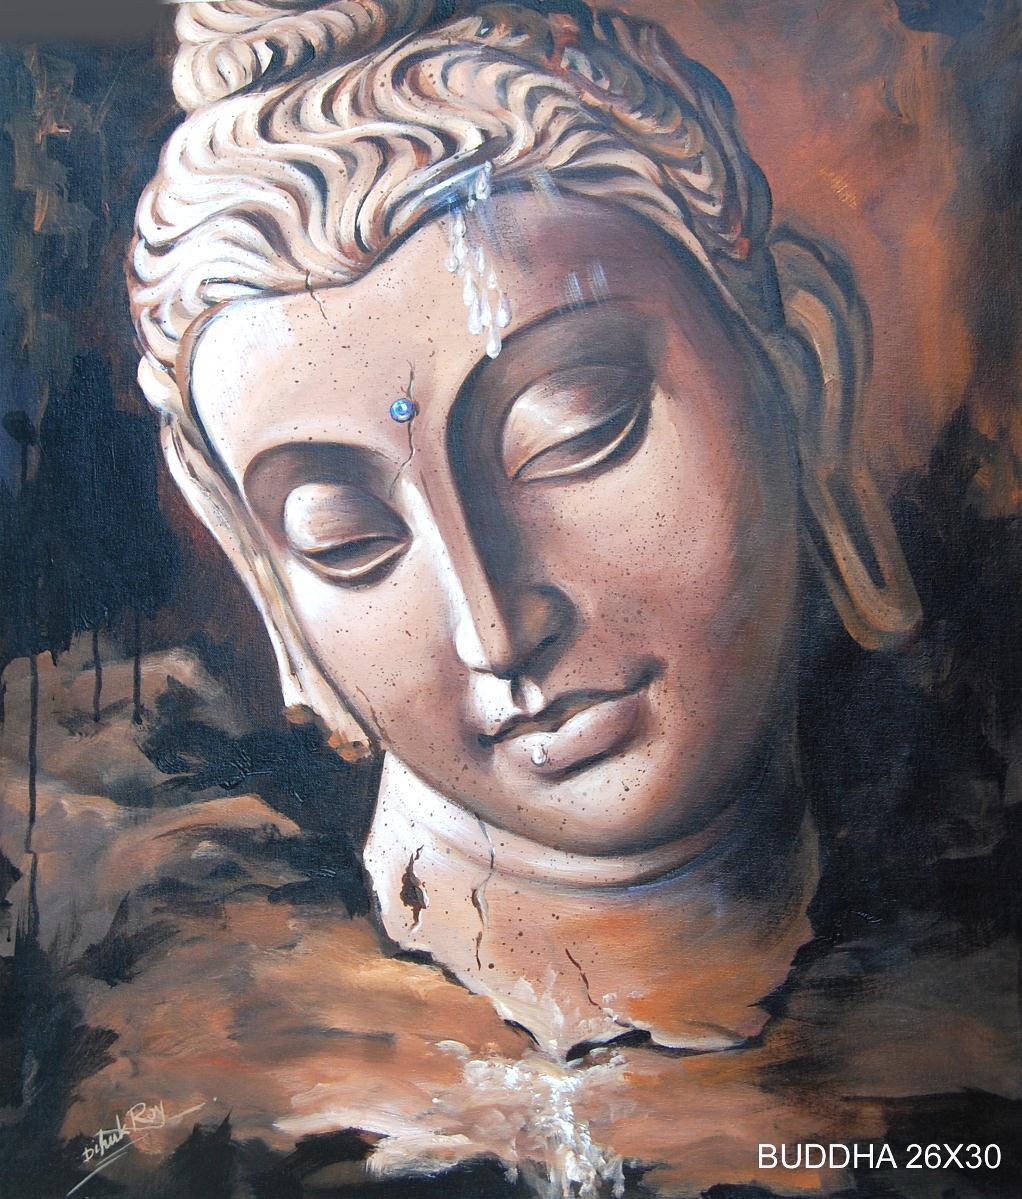 Buddha Painting By Dipak Roy